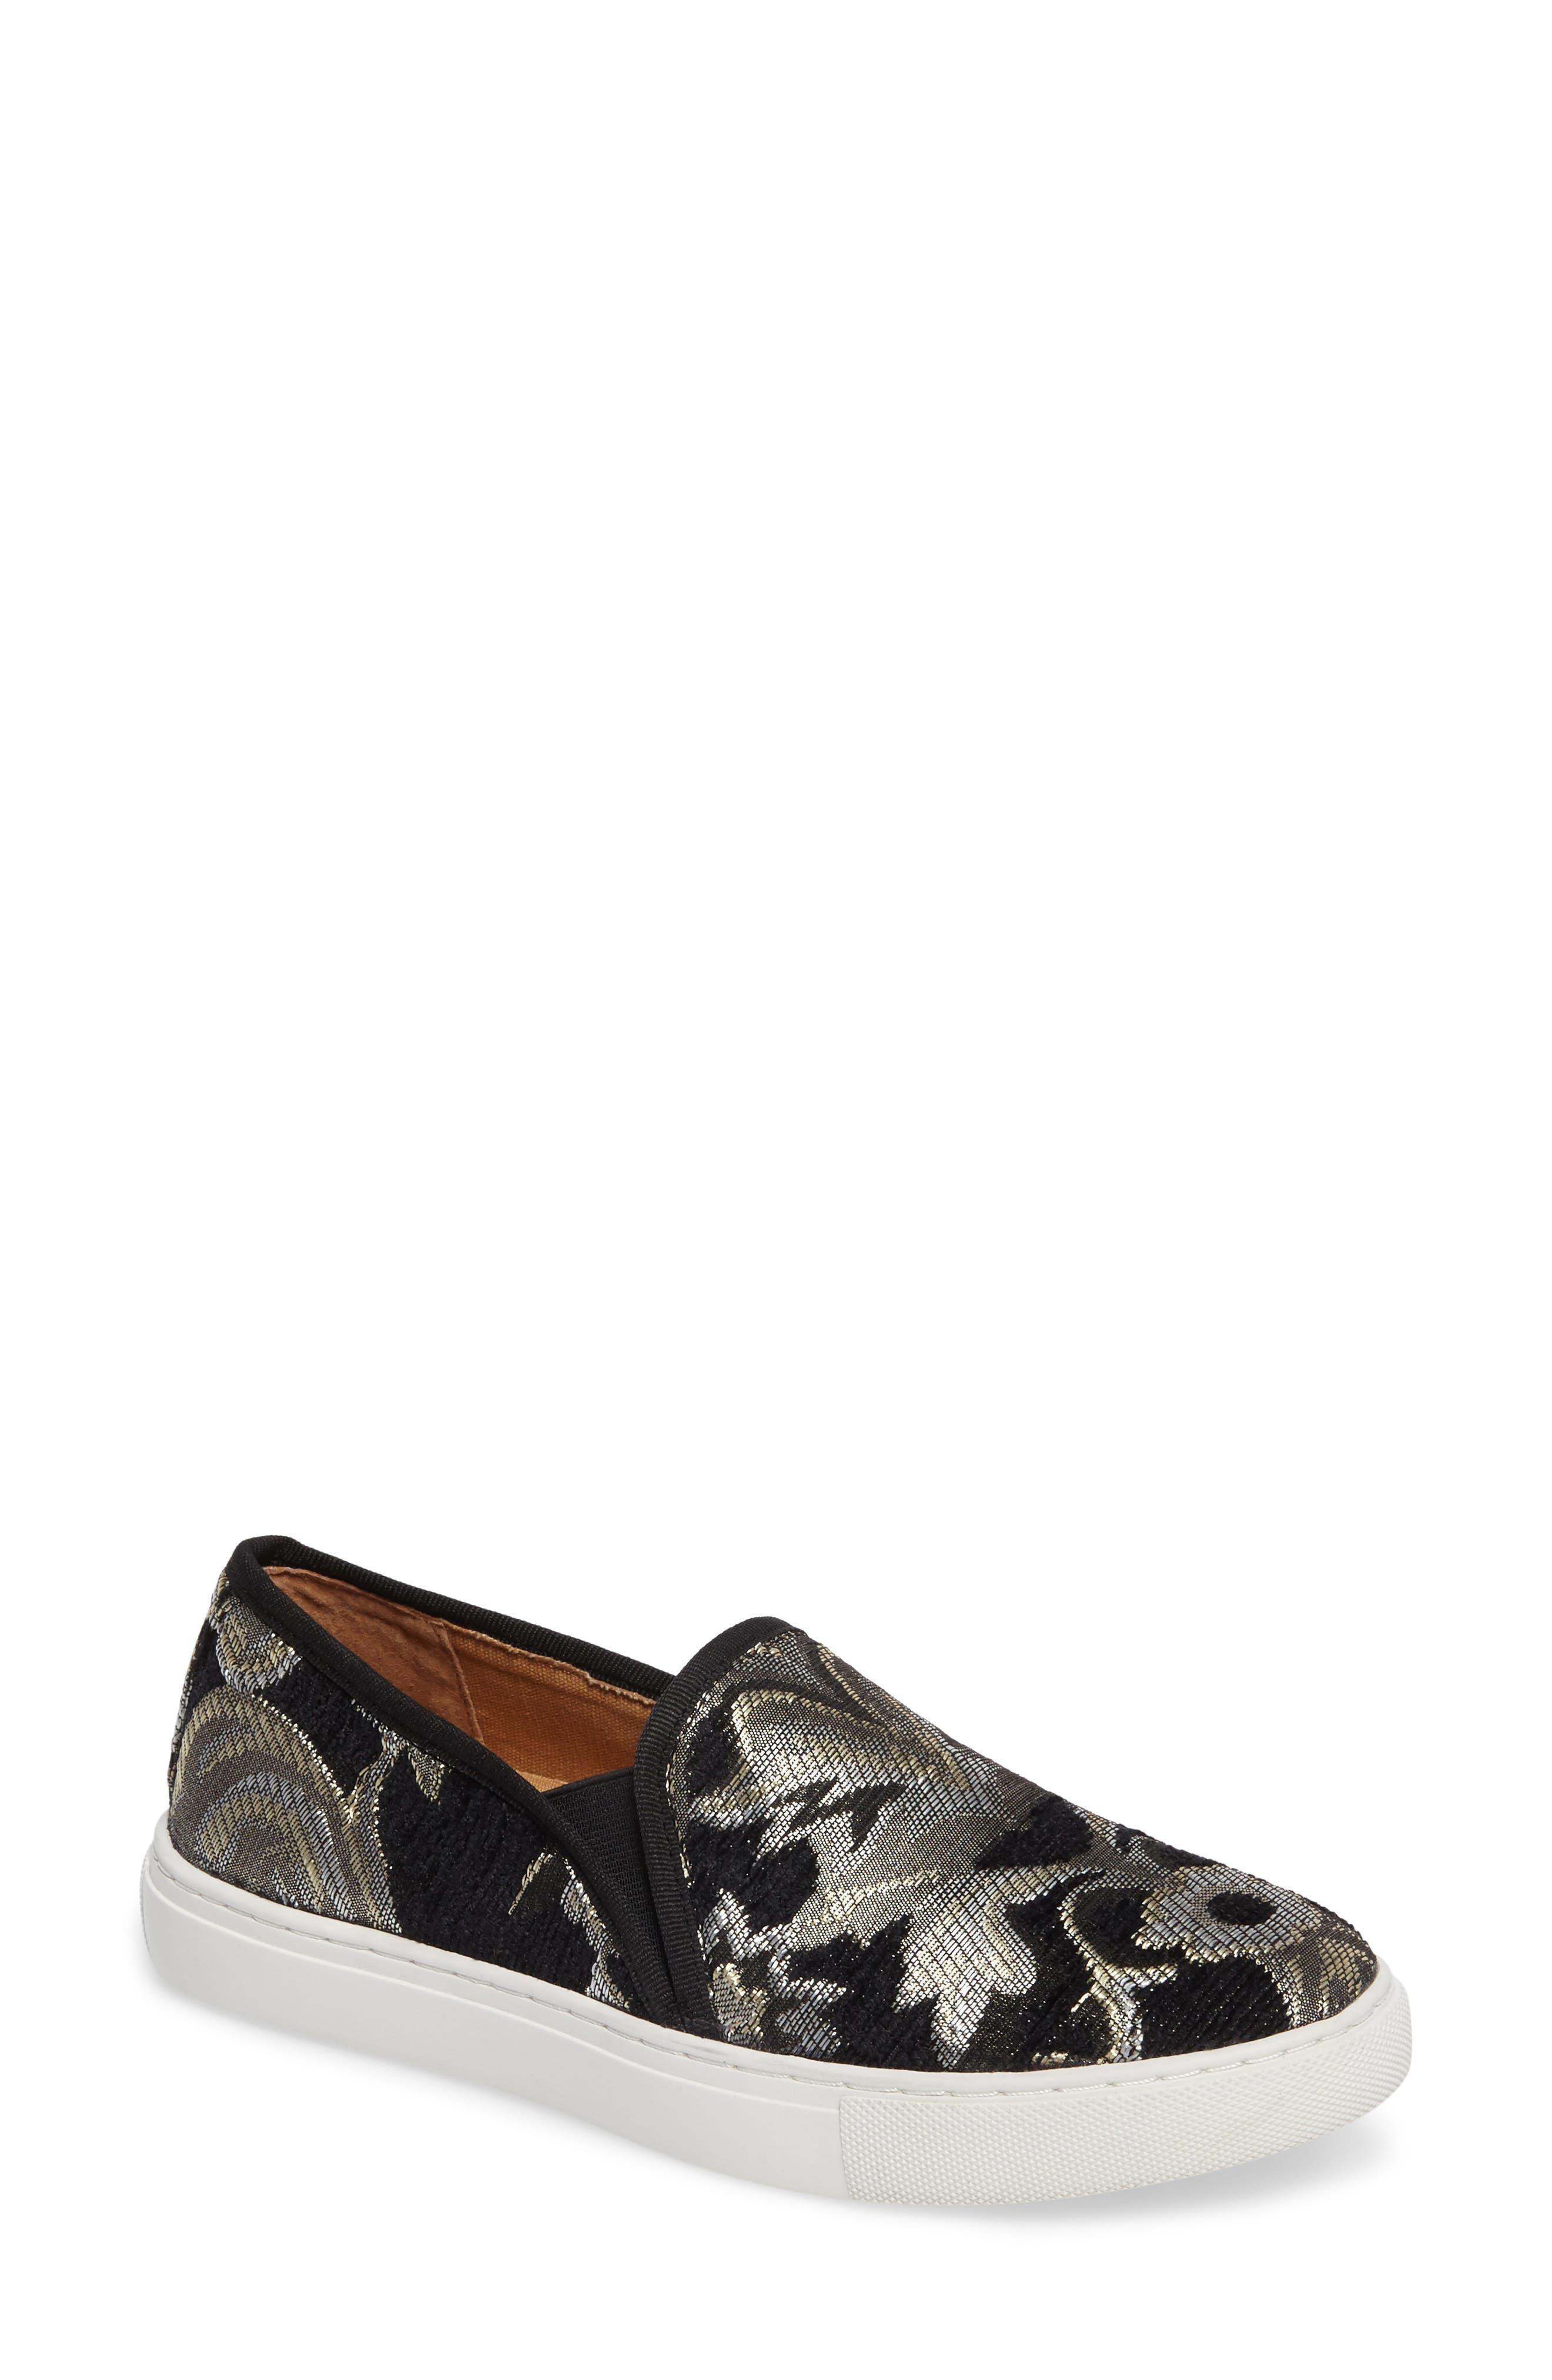 Skipper Slip-On Sneaker,                             Main thumbnail 1, color,                             Black Brocade Leather